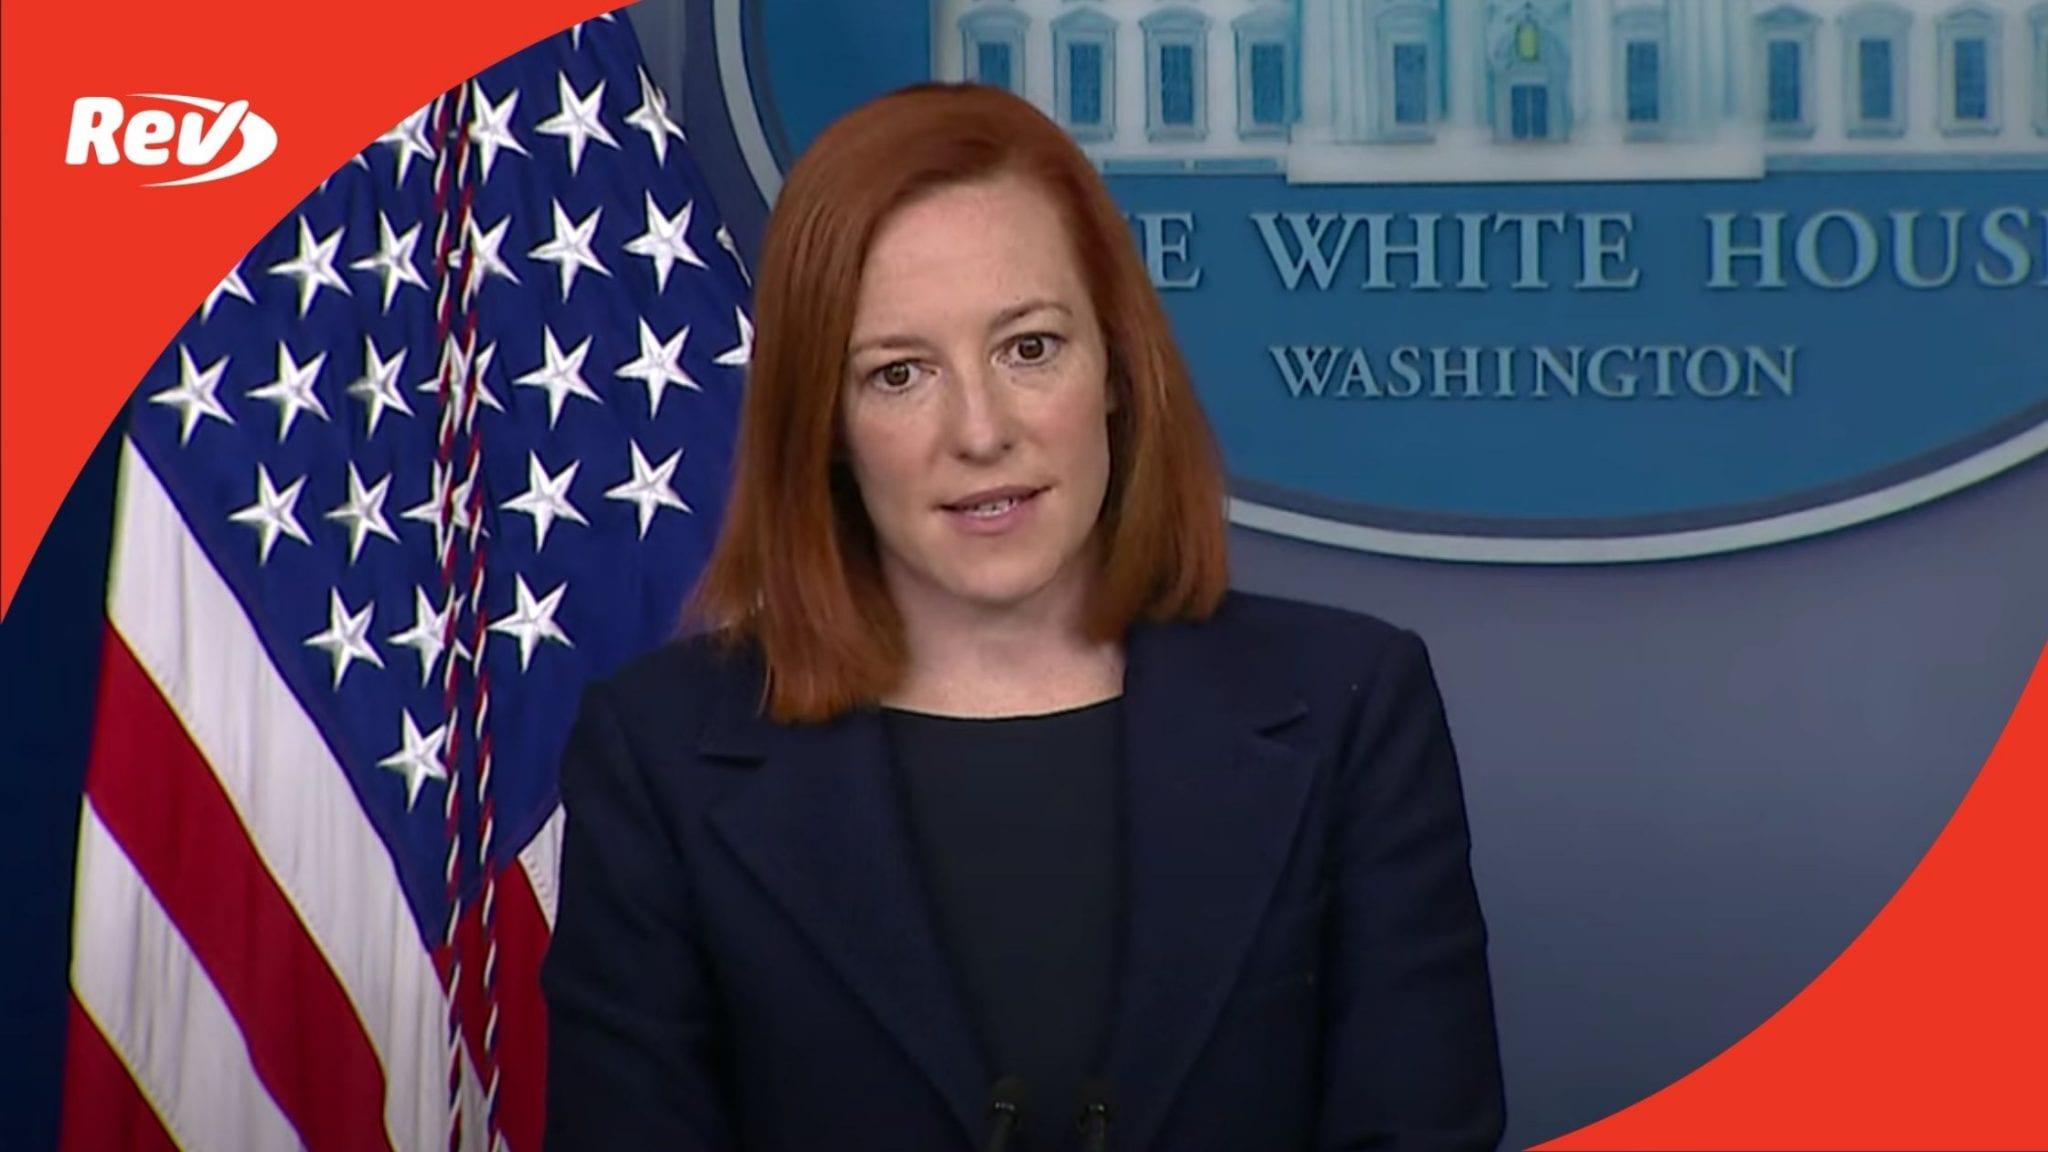 Press Secretary Jen Psaki White House Press Conference Transcript March 29